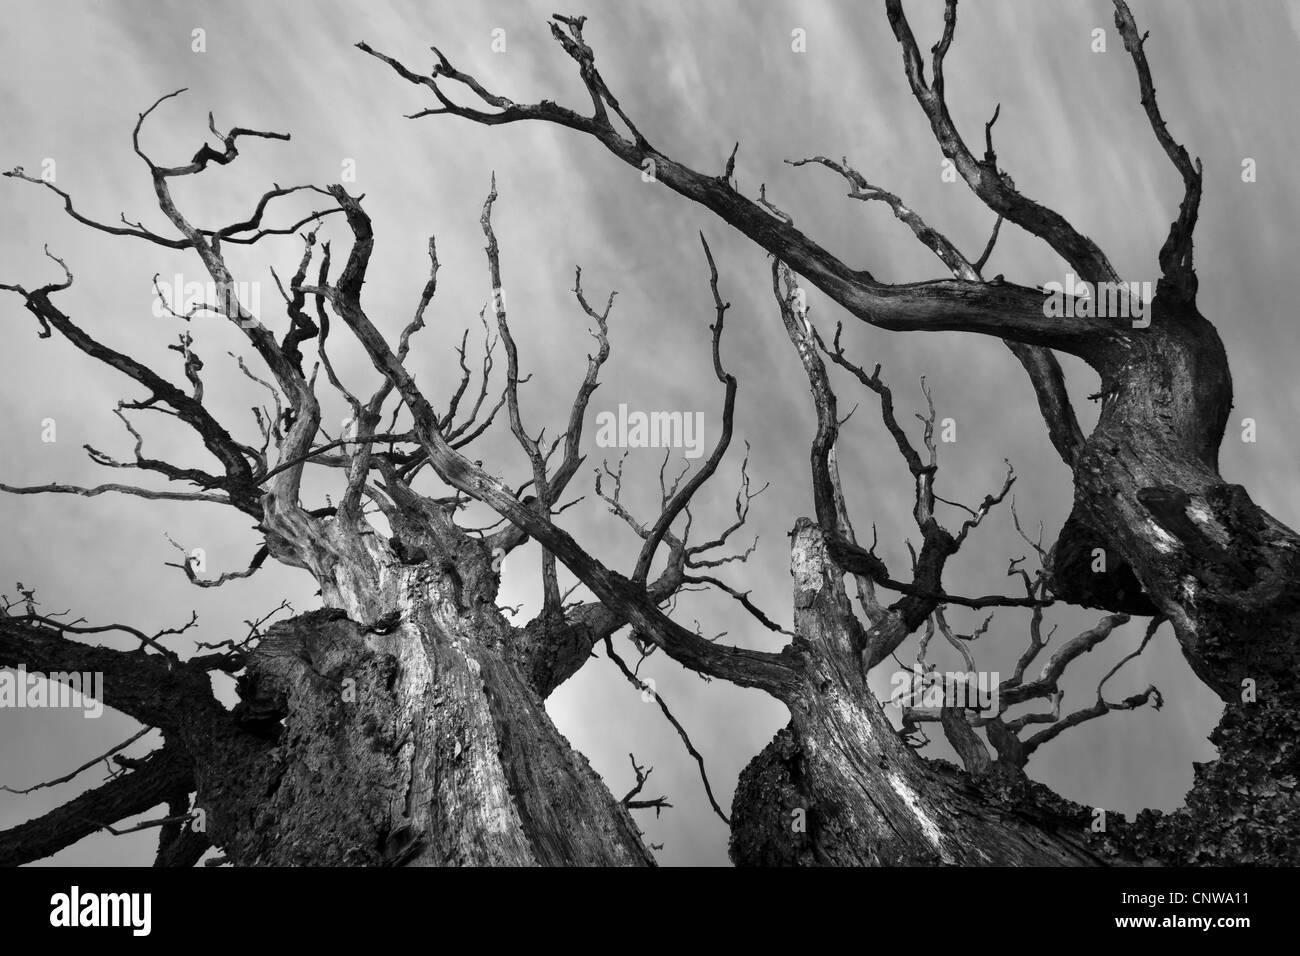 Dry oak tree at Dilling in Rygge kommune, Østfold fylke, Norway. - Stock Image